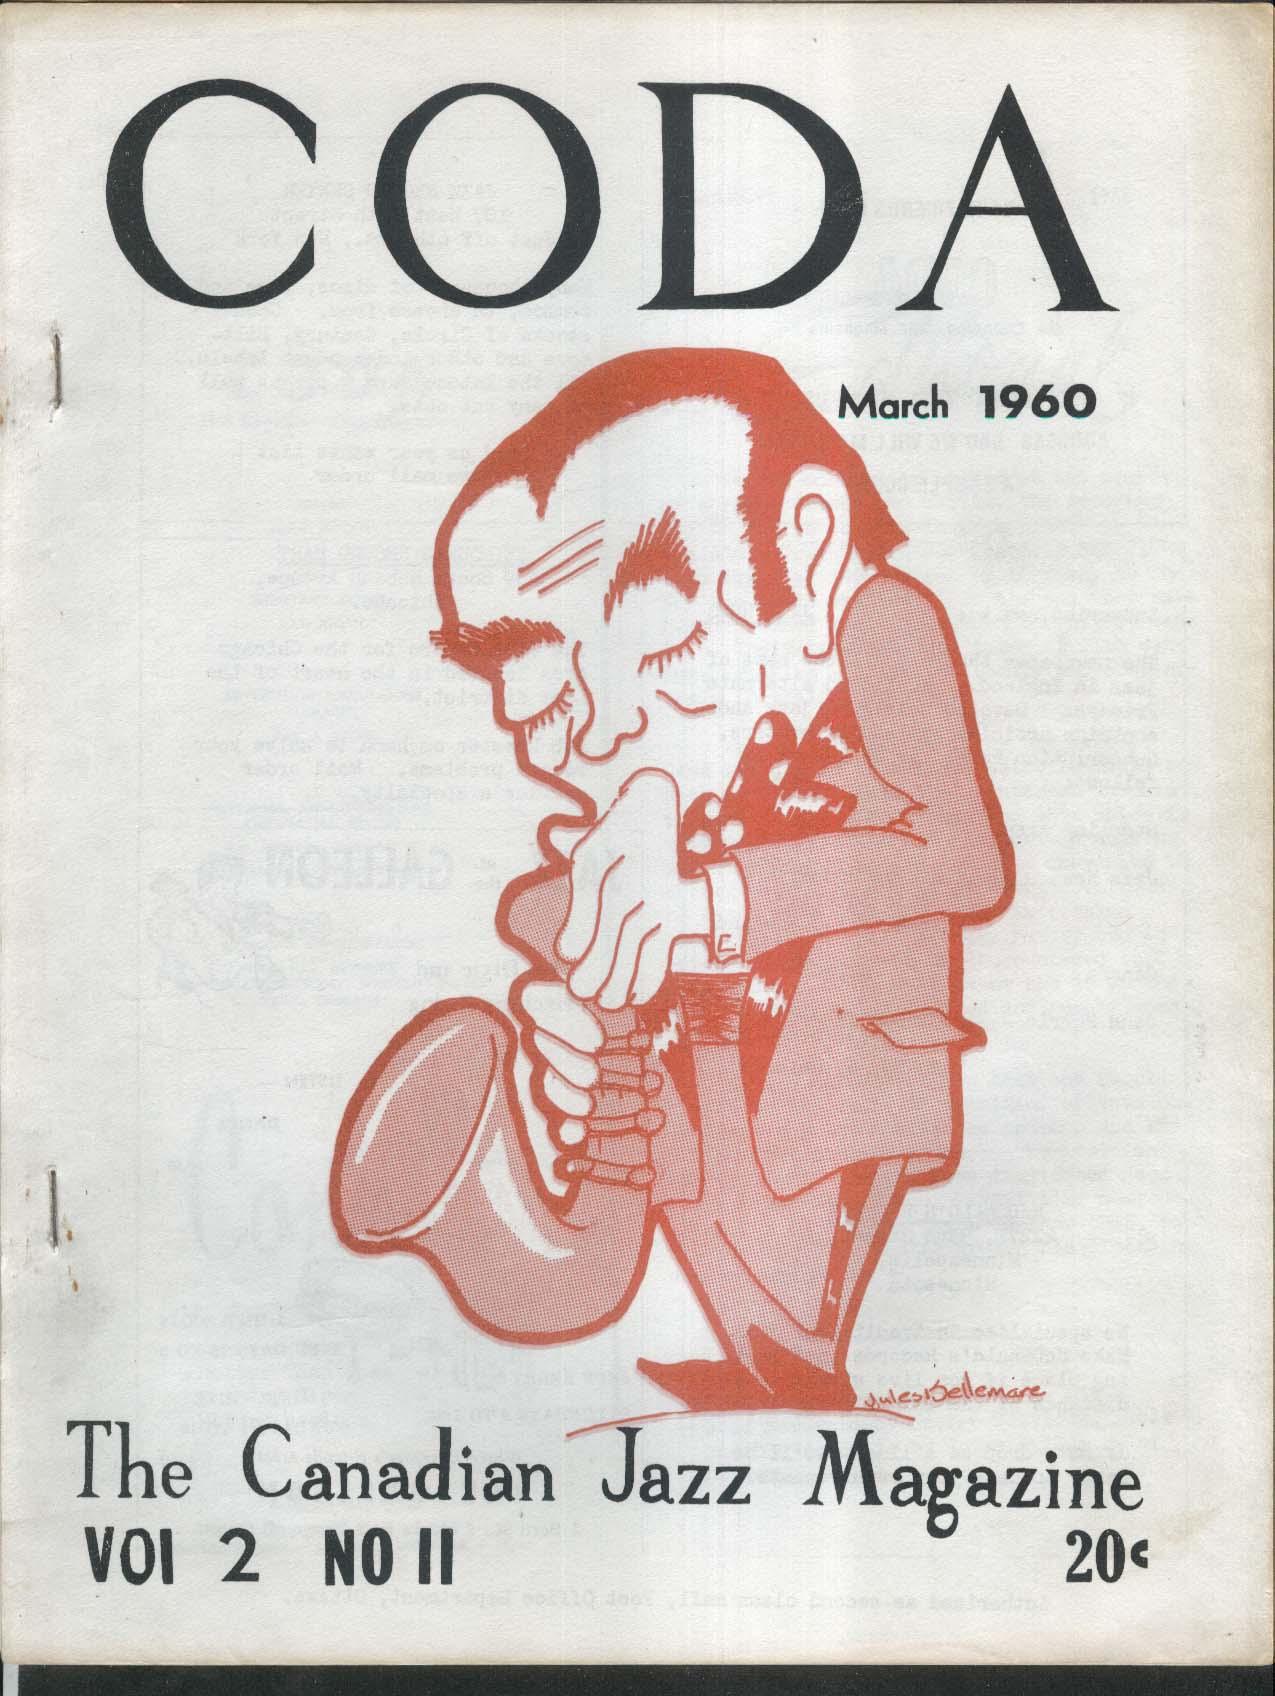 CODA V2 #11 Canadian Jazz Magazine Newport News 3 1960